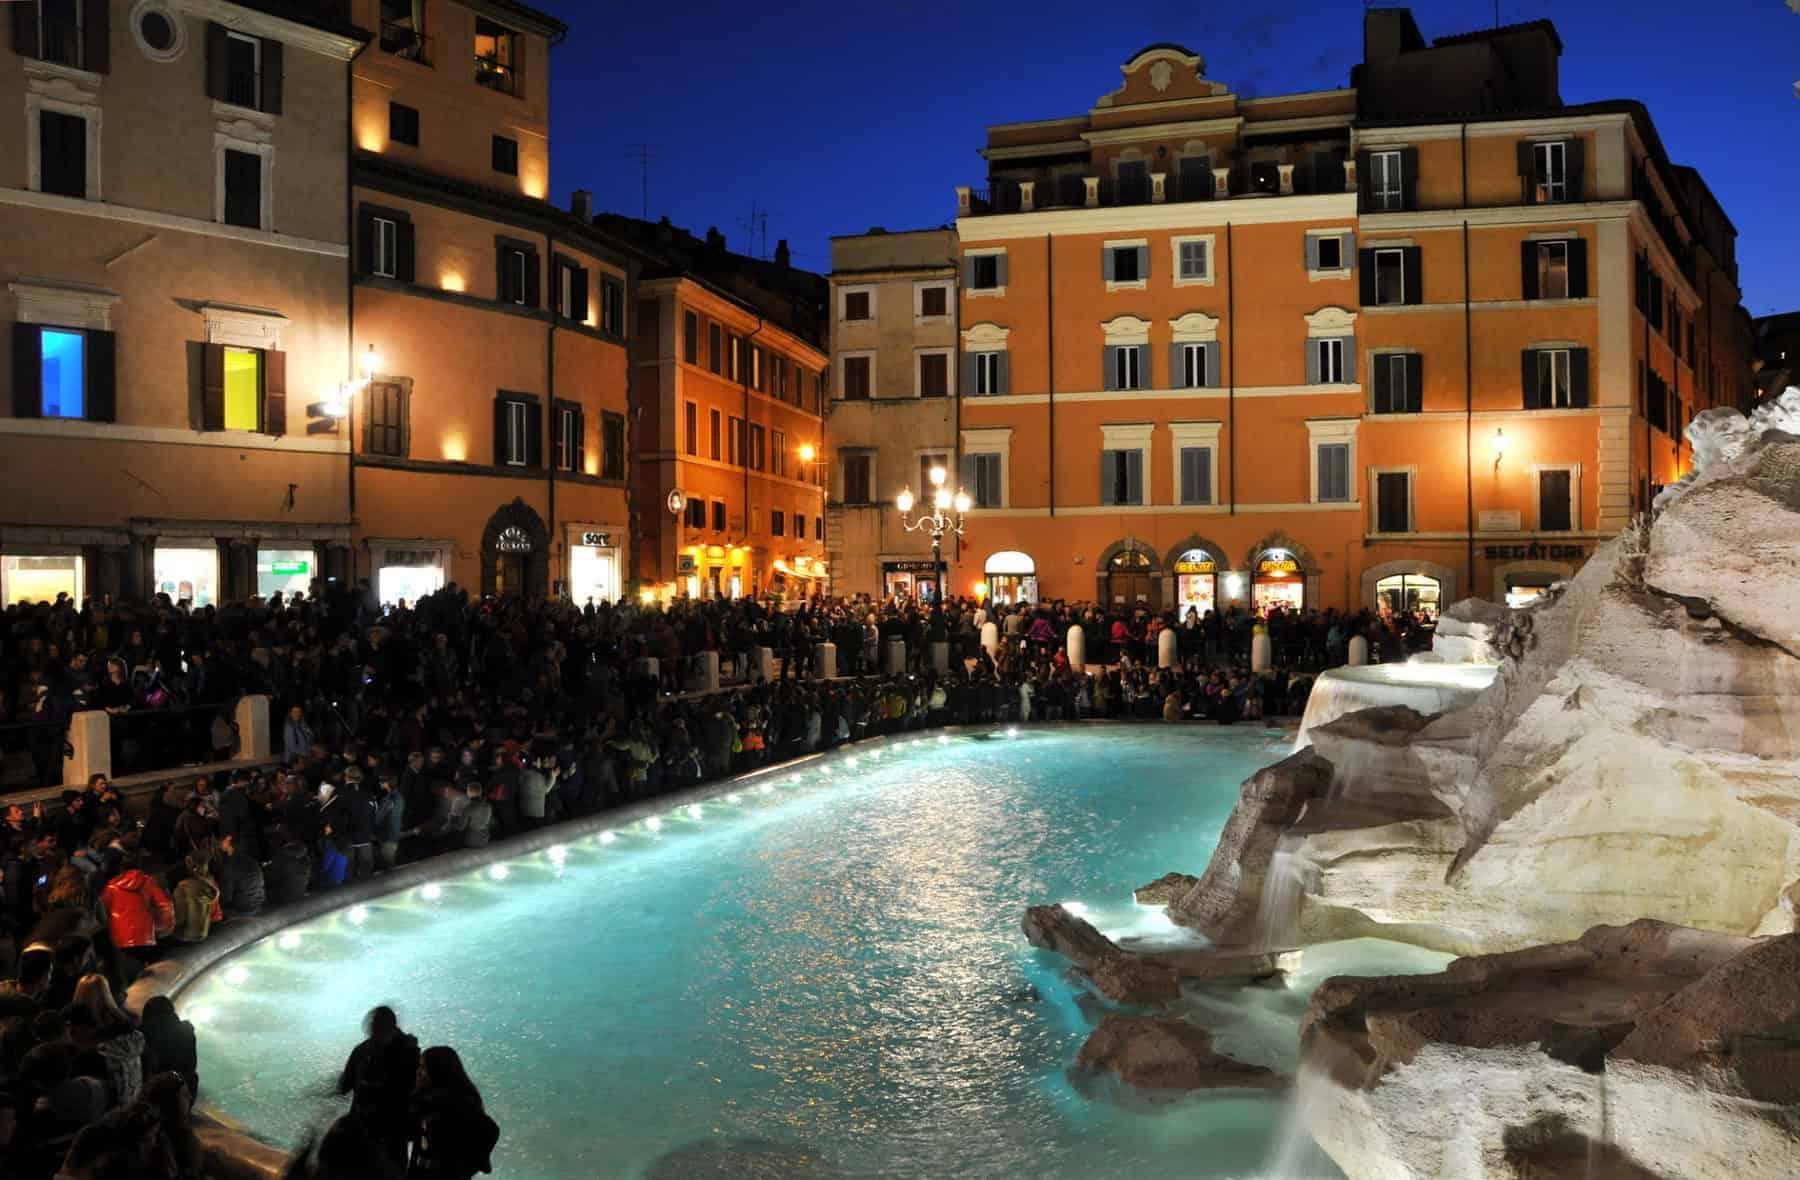 The Trevi Fountain illuminated at night (Fontana di Trevi), Rome